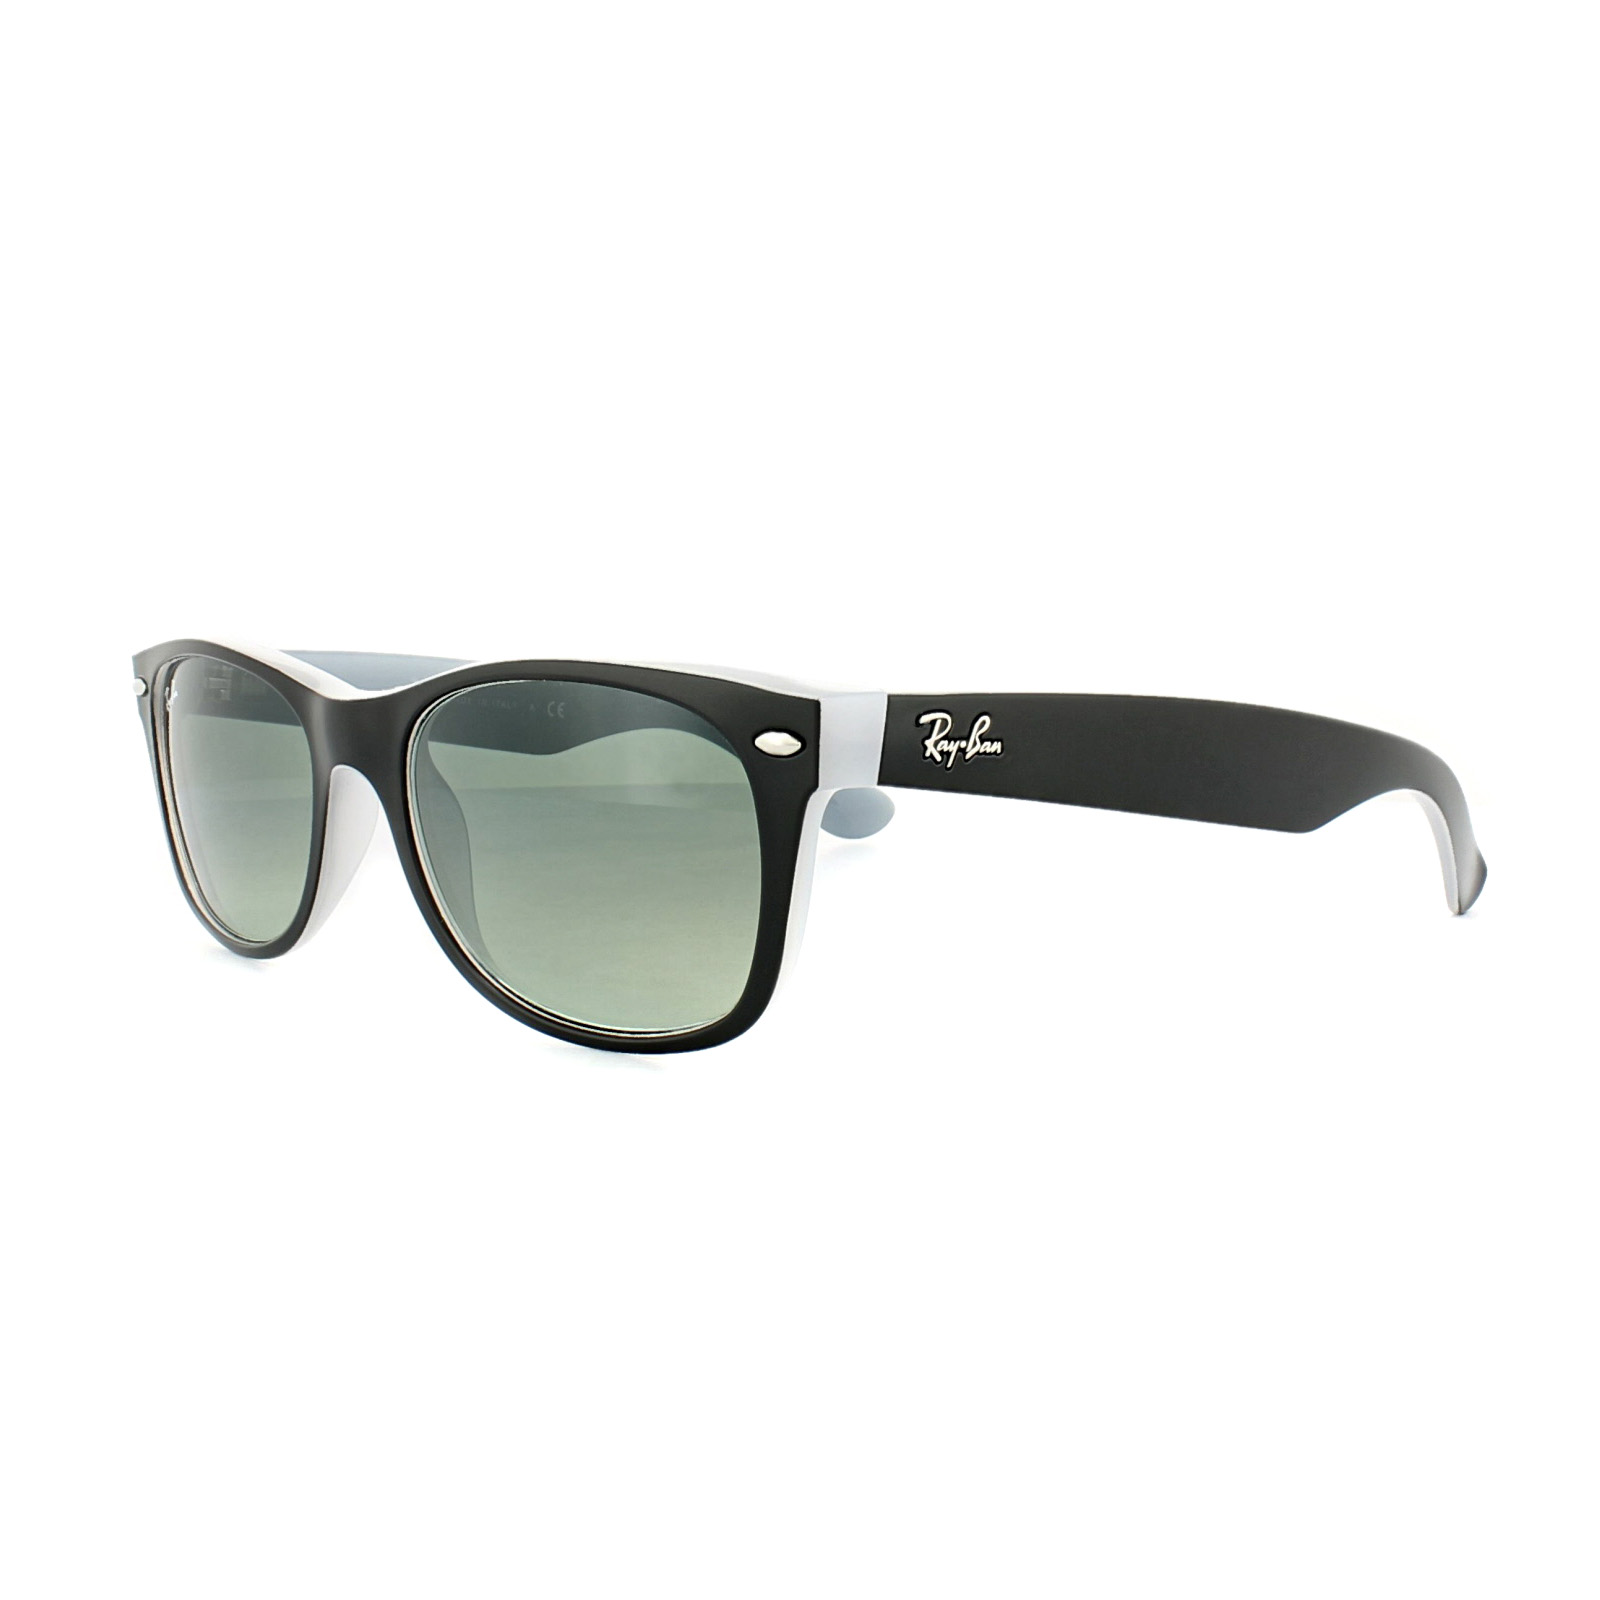 a1a8ccee603 Sentinel Ray-Ban Sunglasses New Wayfarer 2132 630971 Matt Black Opal Ice  Grey Gradient S